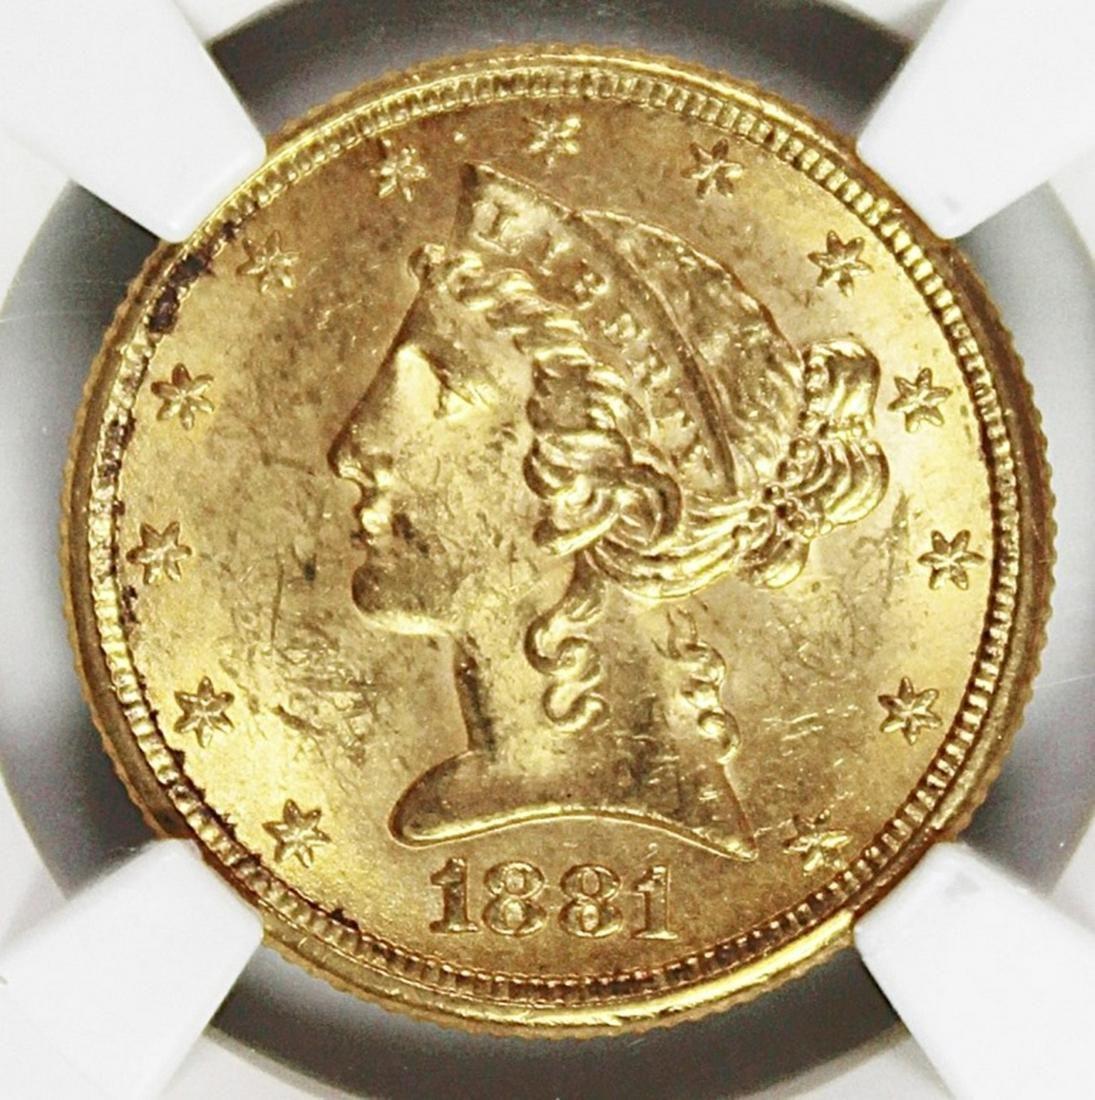 1881 $5.00 LIBERTY GOLD